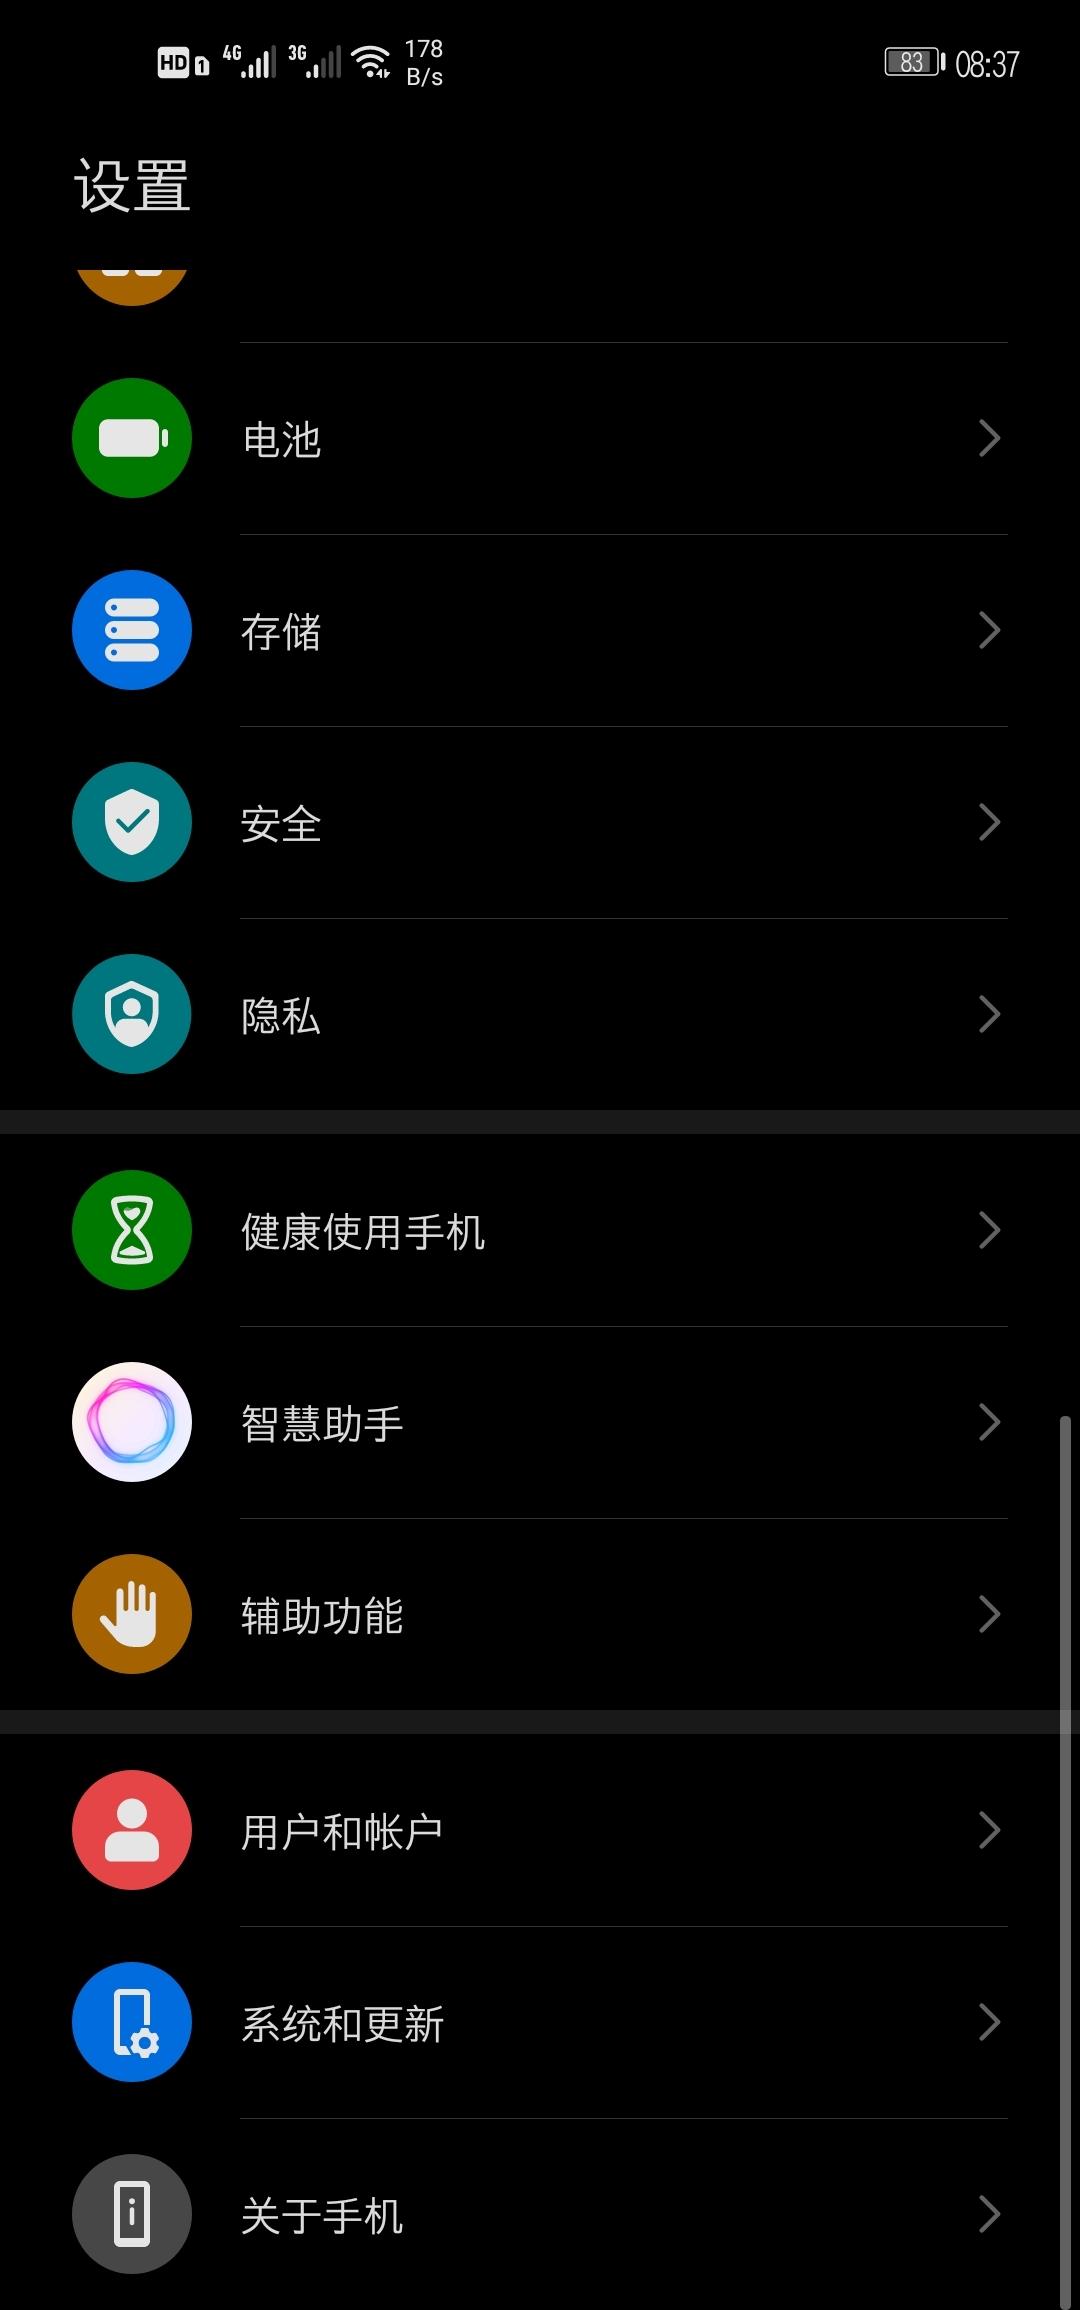 Screenshot_20210418_083718_com.android.settings.jpg